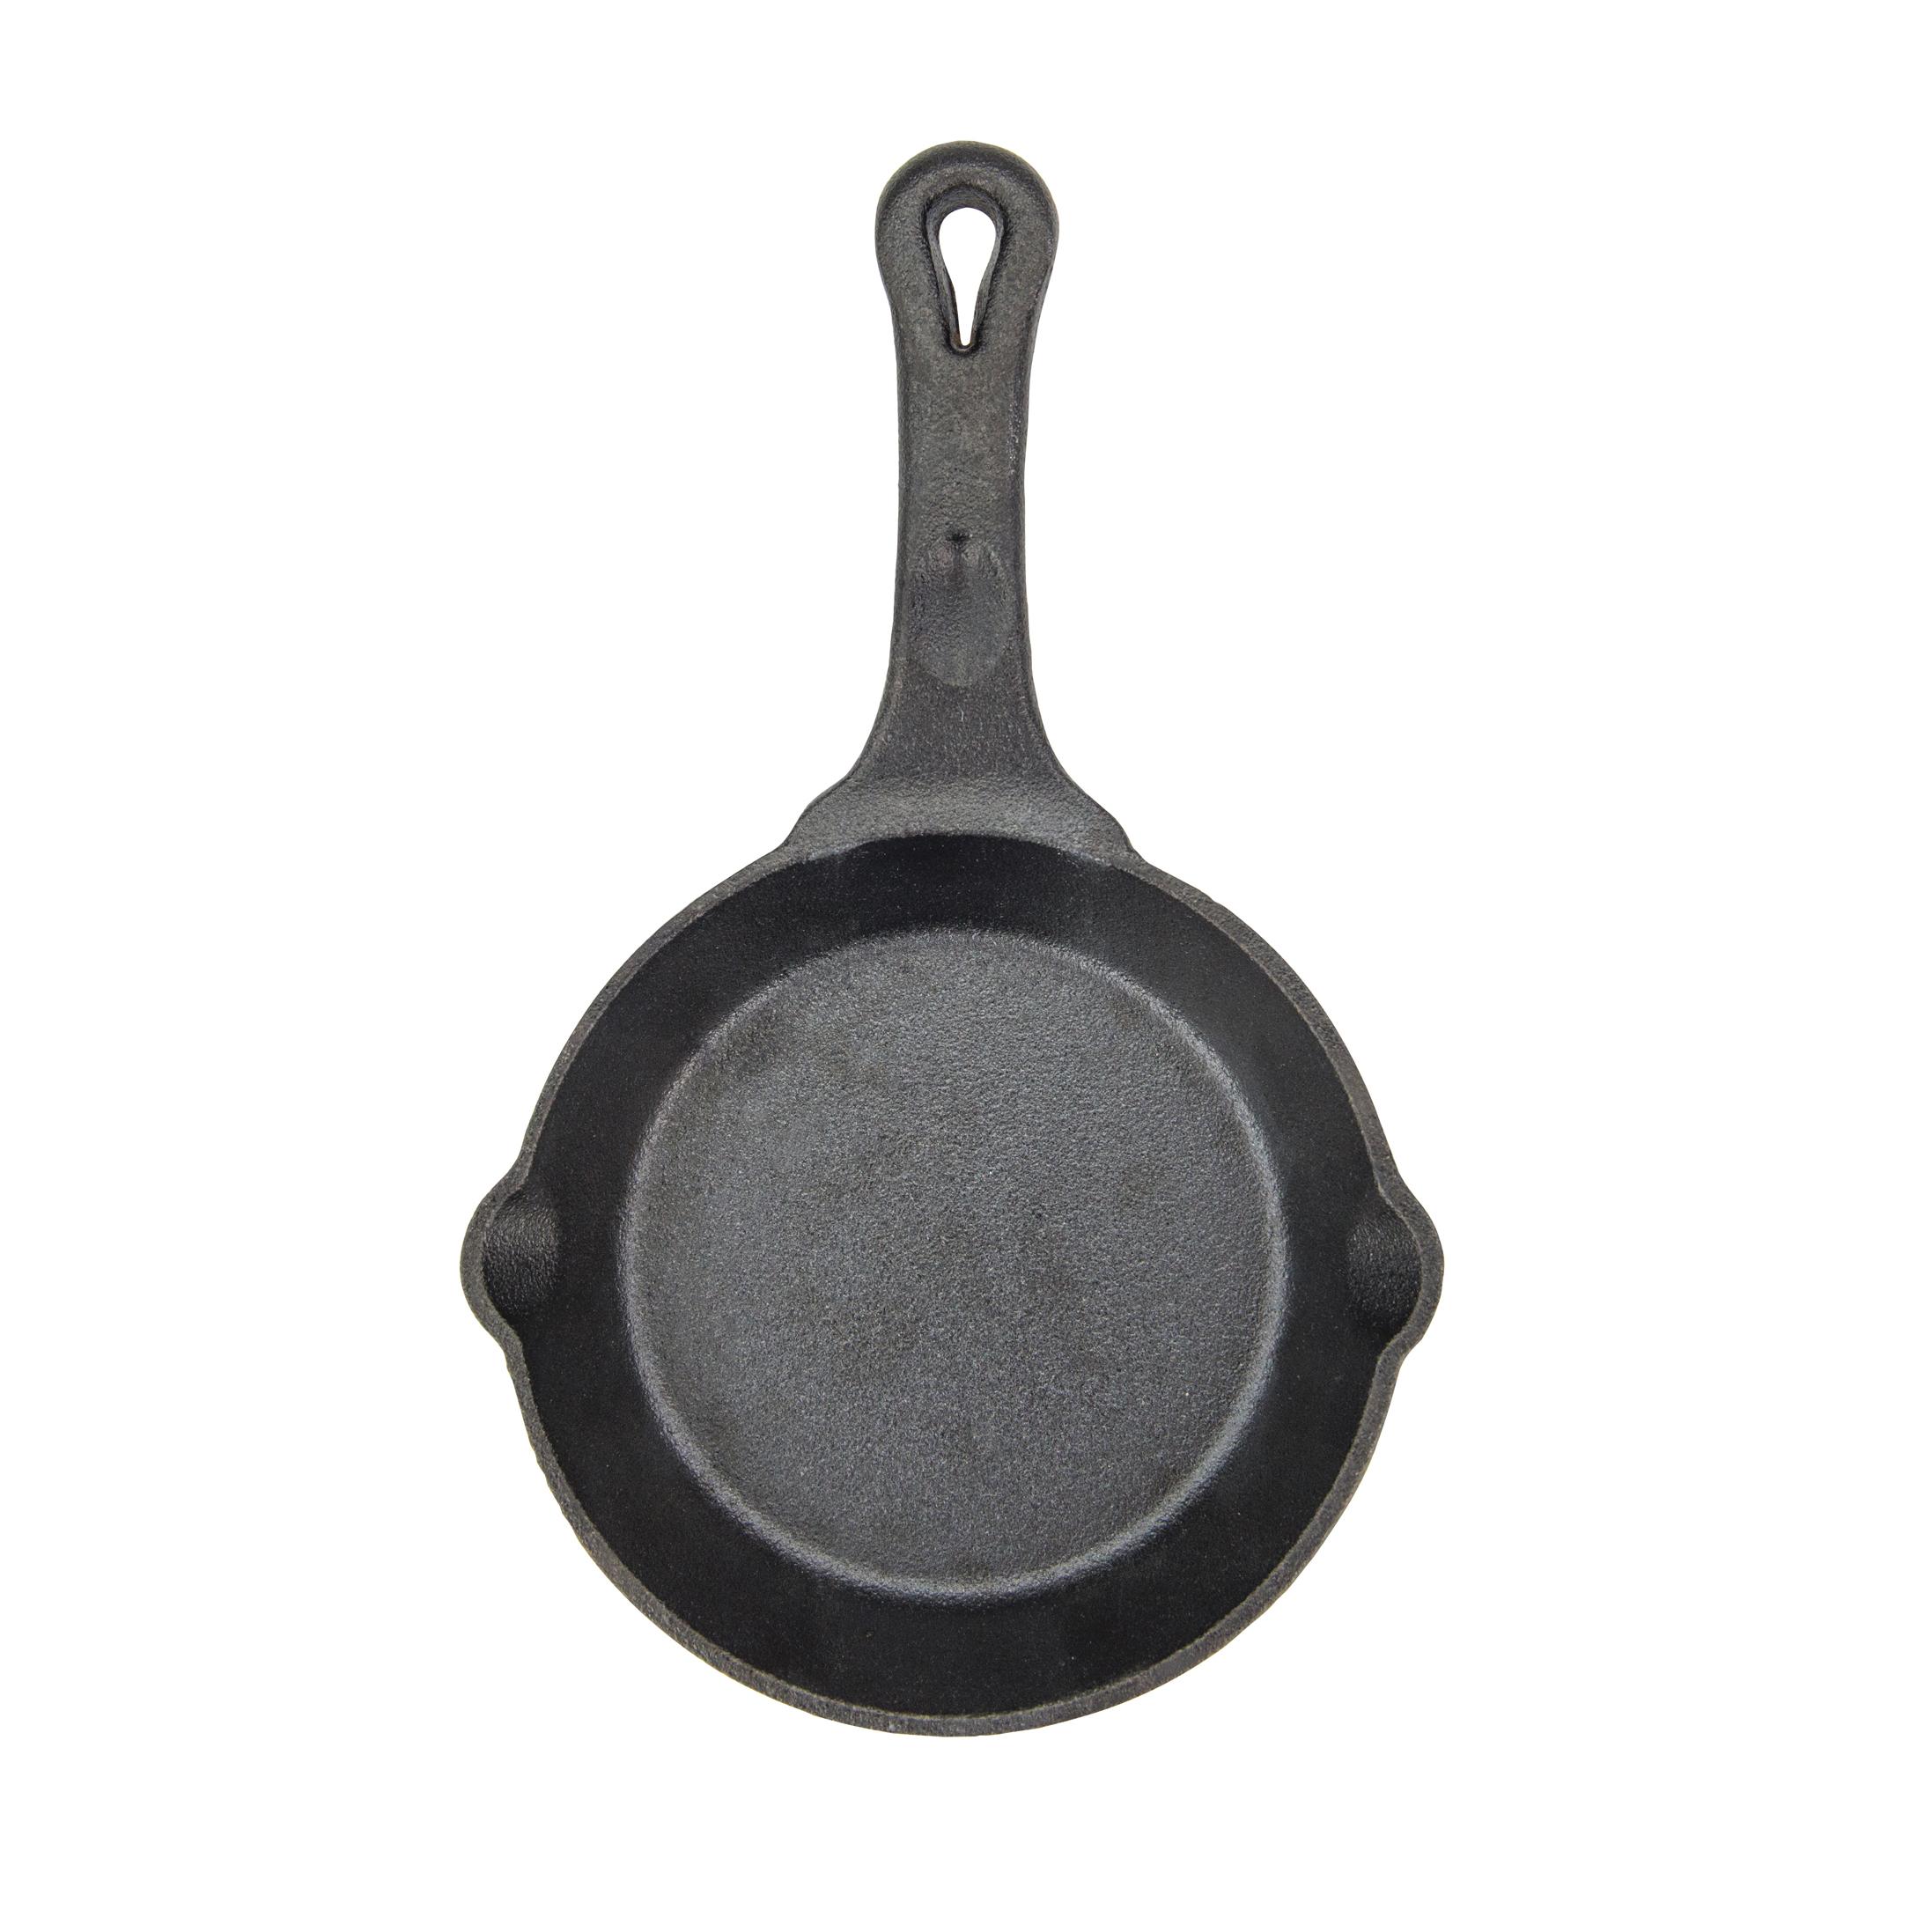 Winco CAST-6 cast iron fry pan